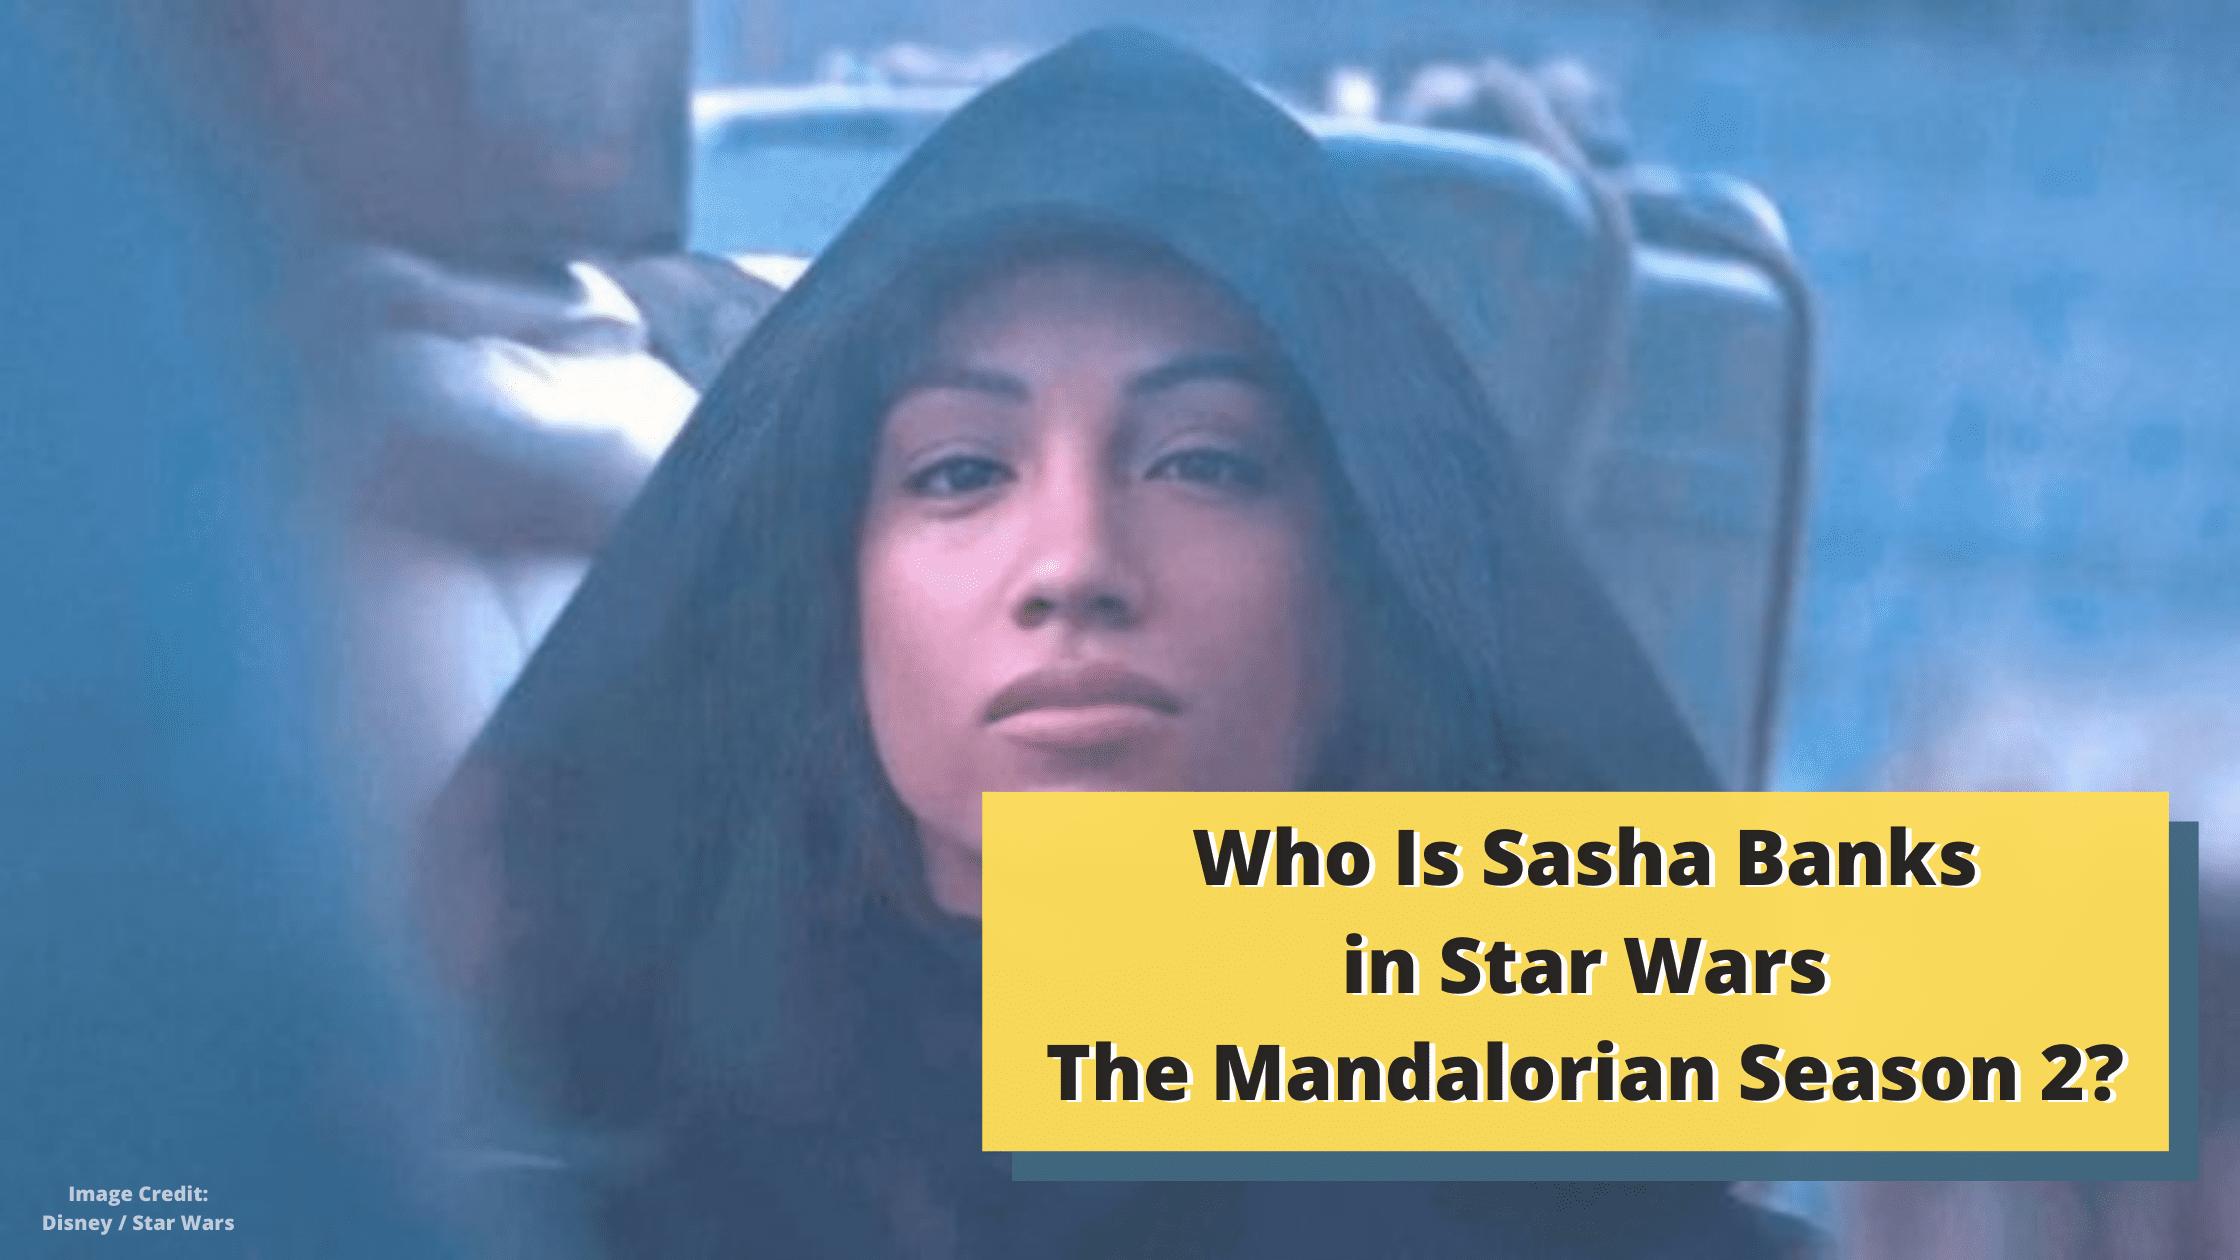 Who Is Sasha Banks in Star Wars The Mandalorian Season 2?